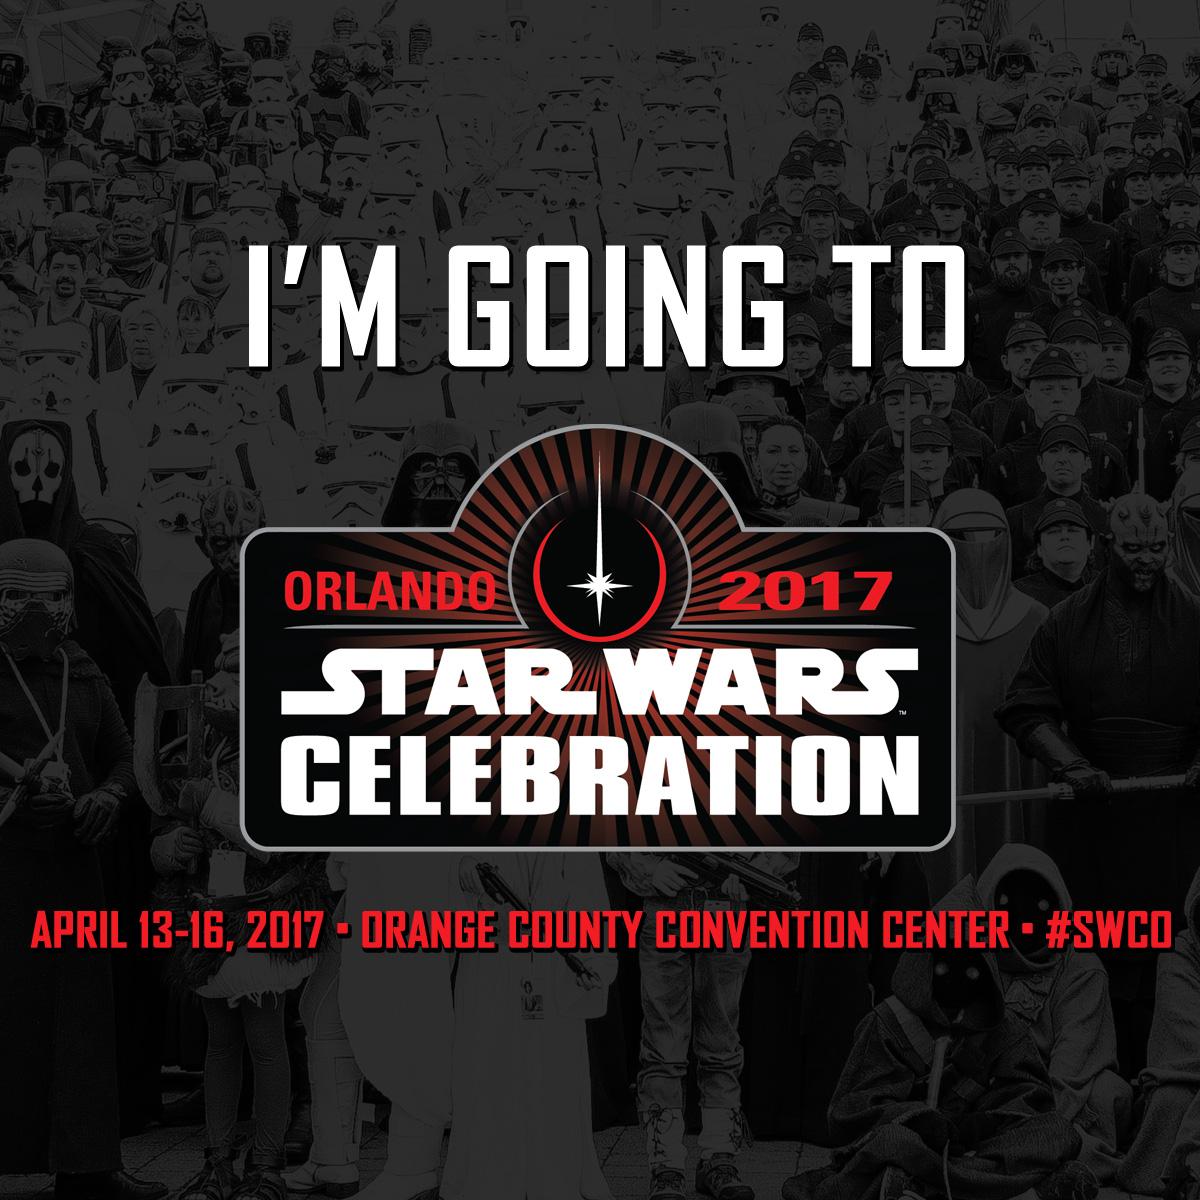 Star Wars Celebration Orlando '17